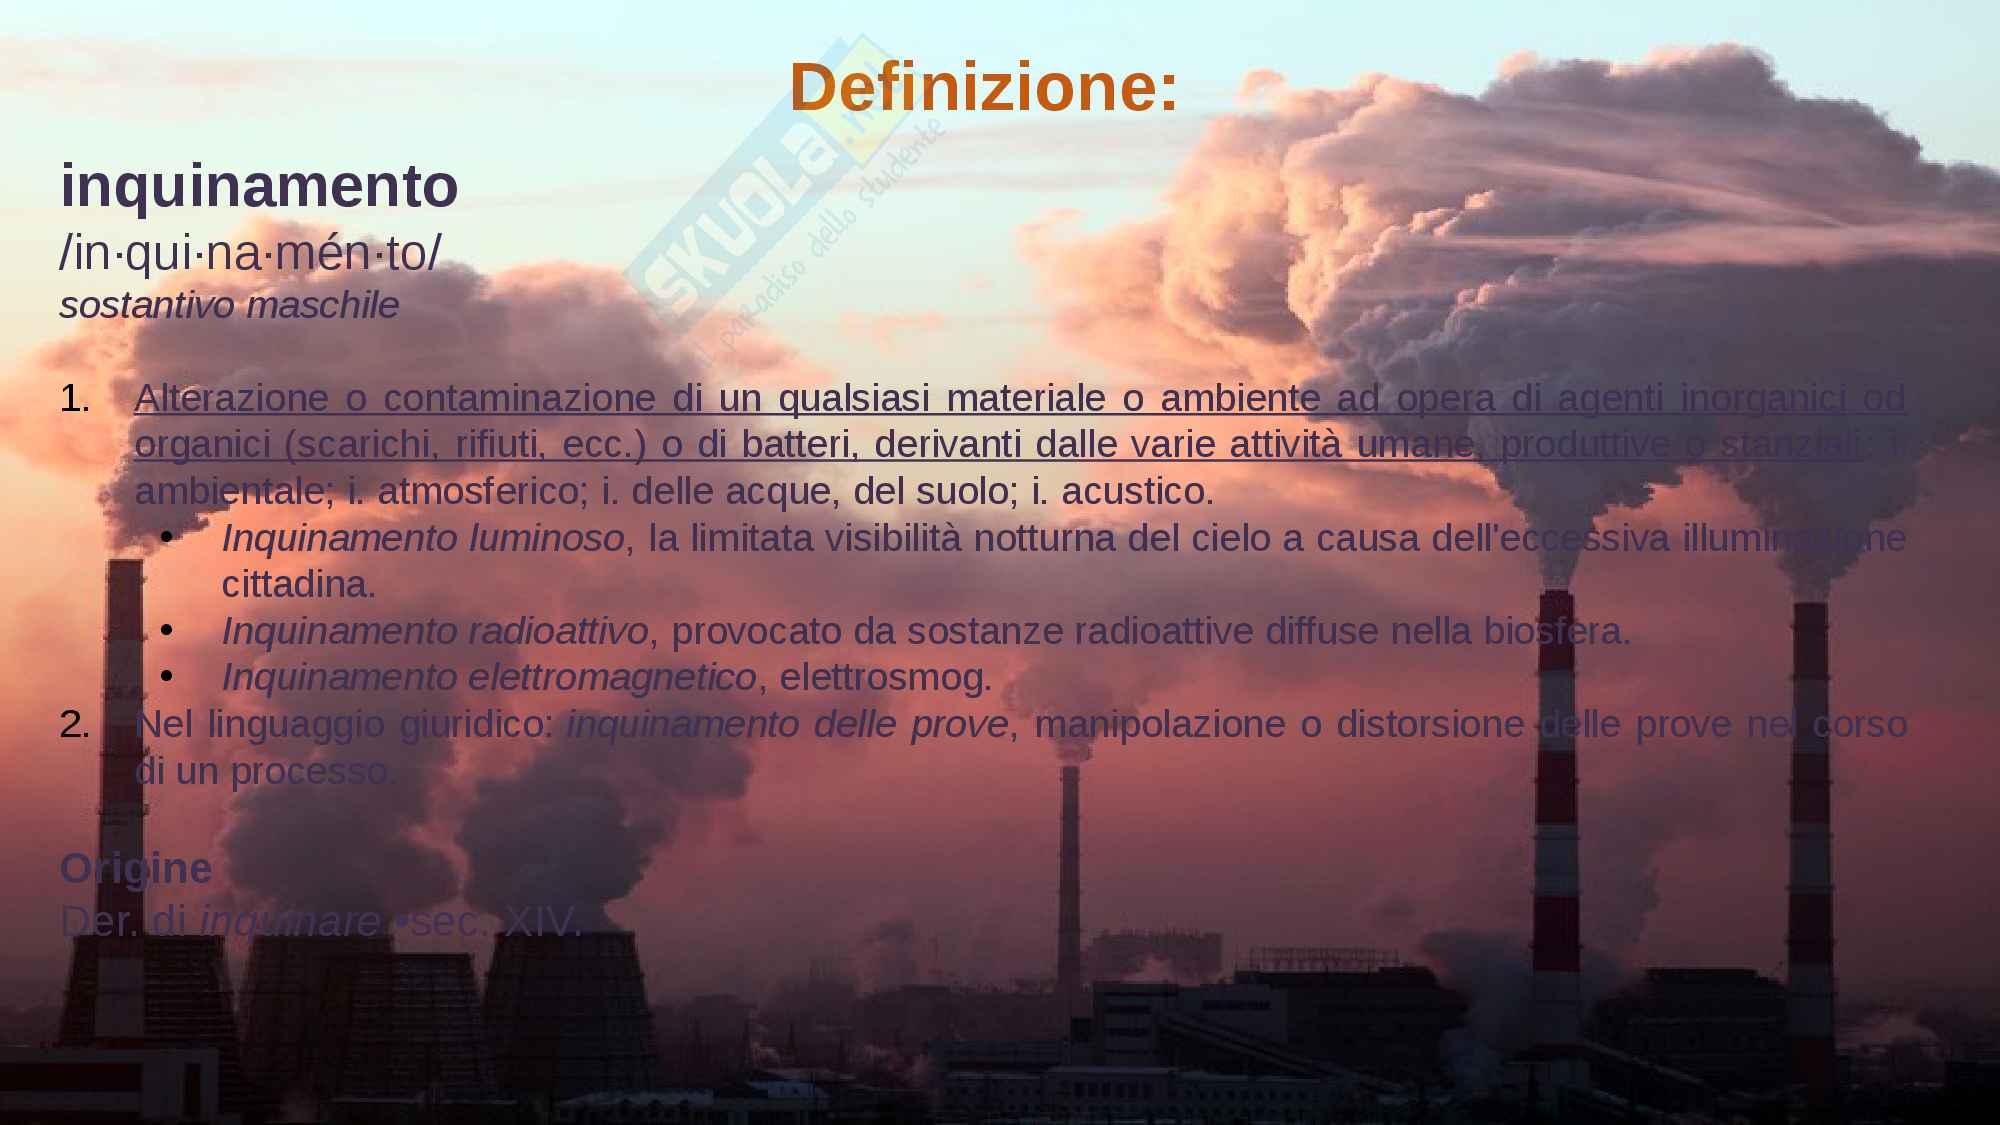 L'inquinamento globale Pag. 2